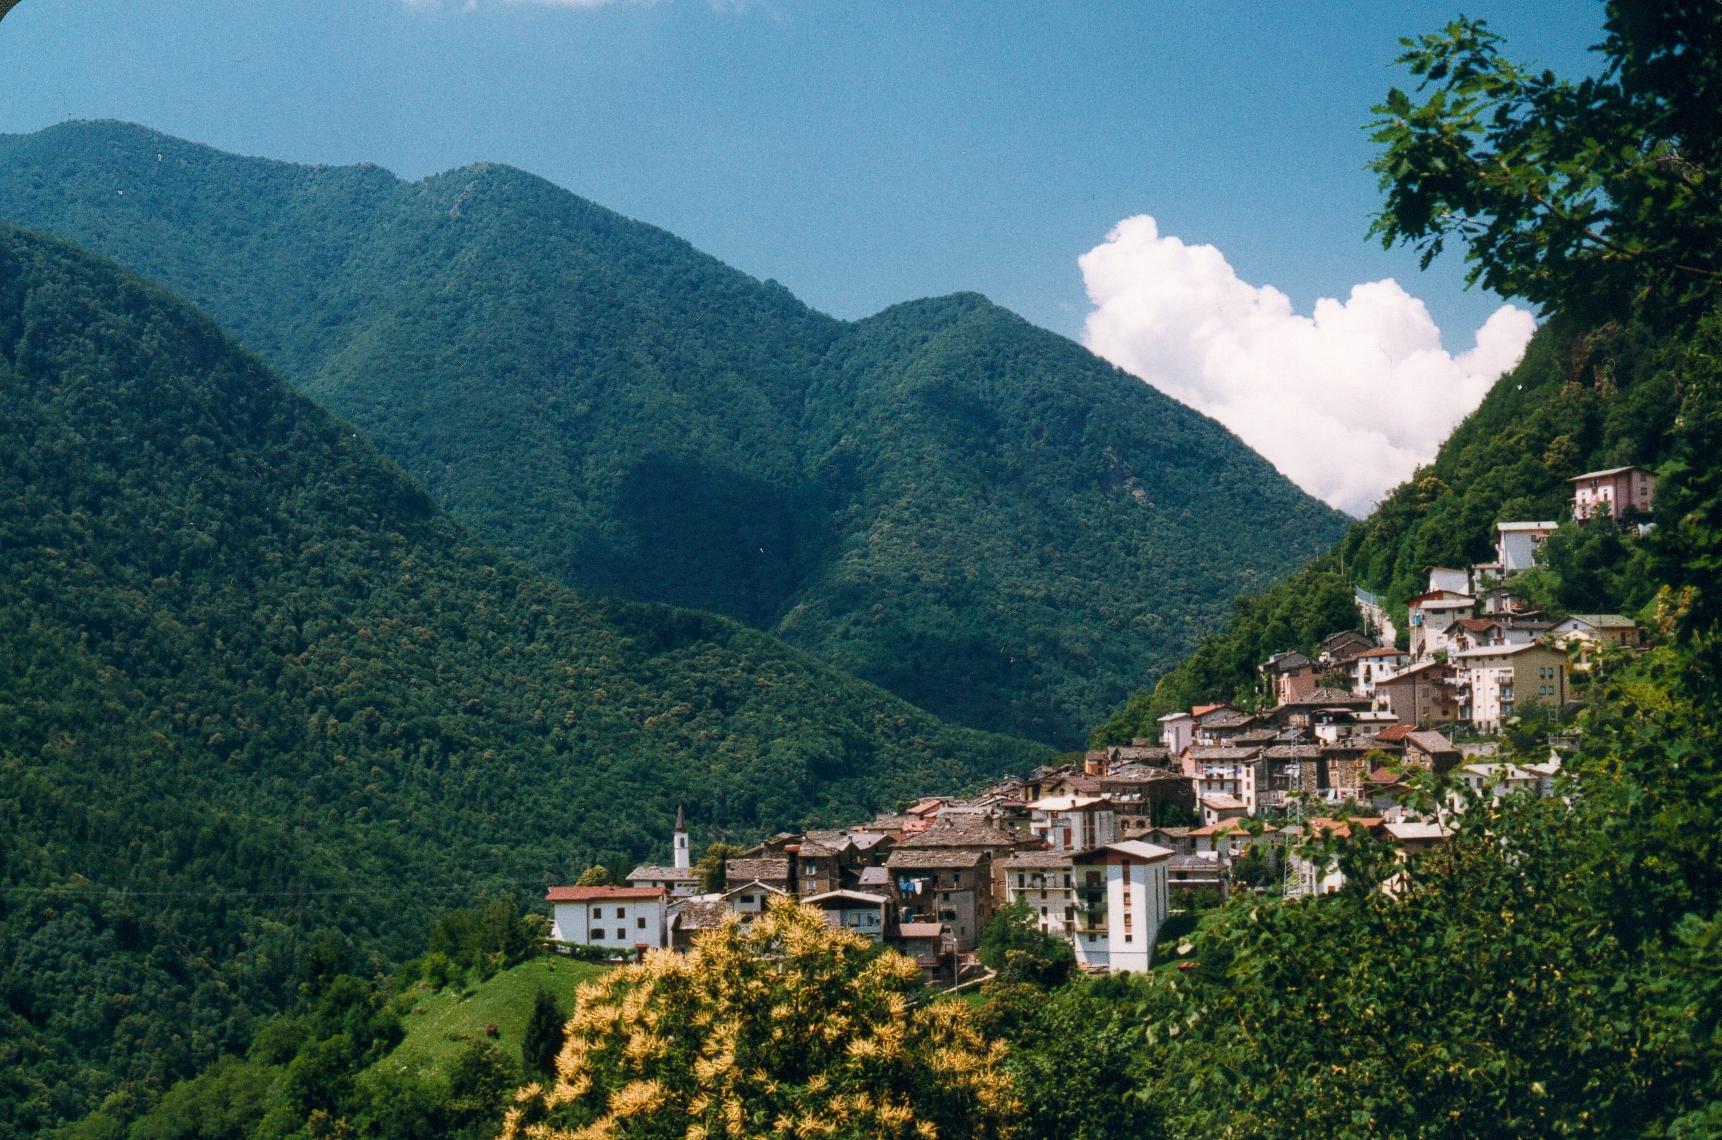 http://upload.wikimedia.org/wikipedia/commons/7/7b/Italian_town_Pagnona.jpg